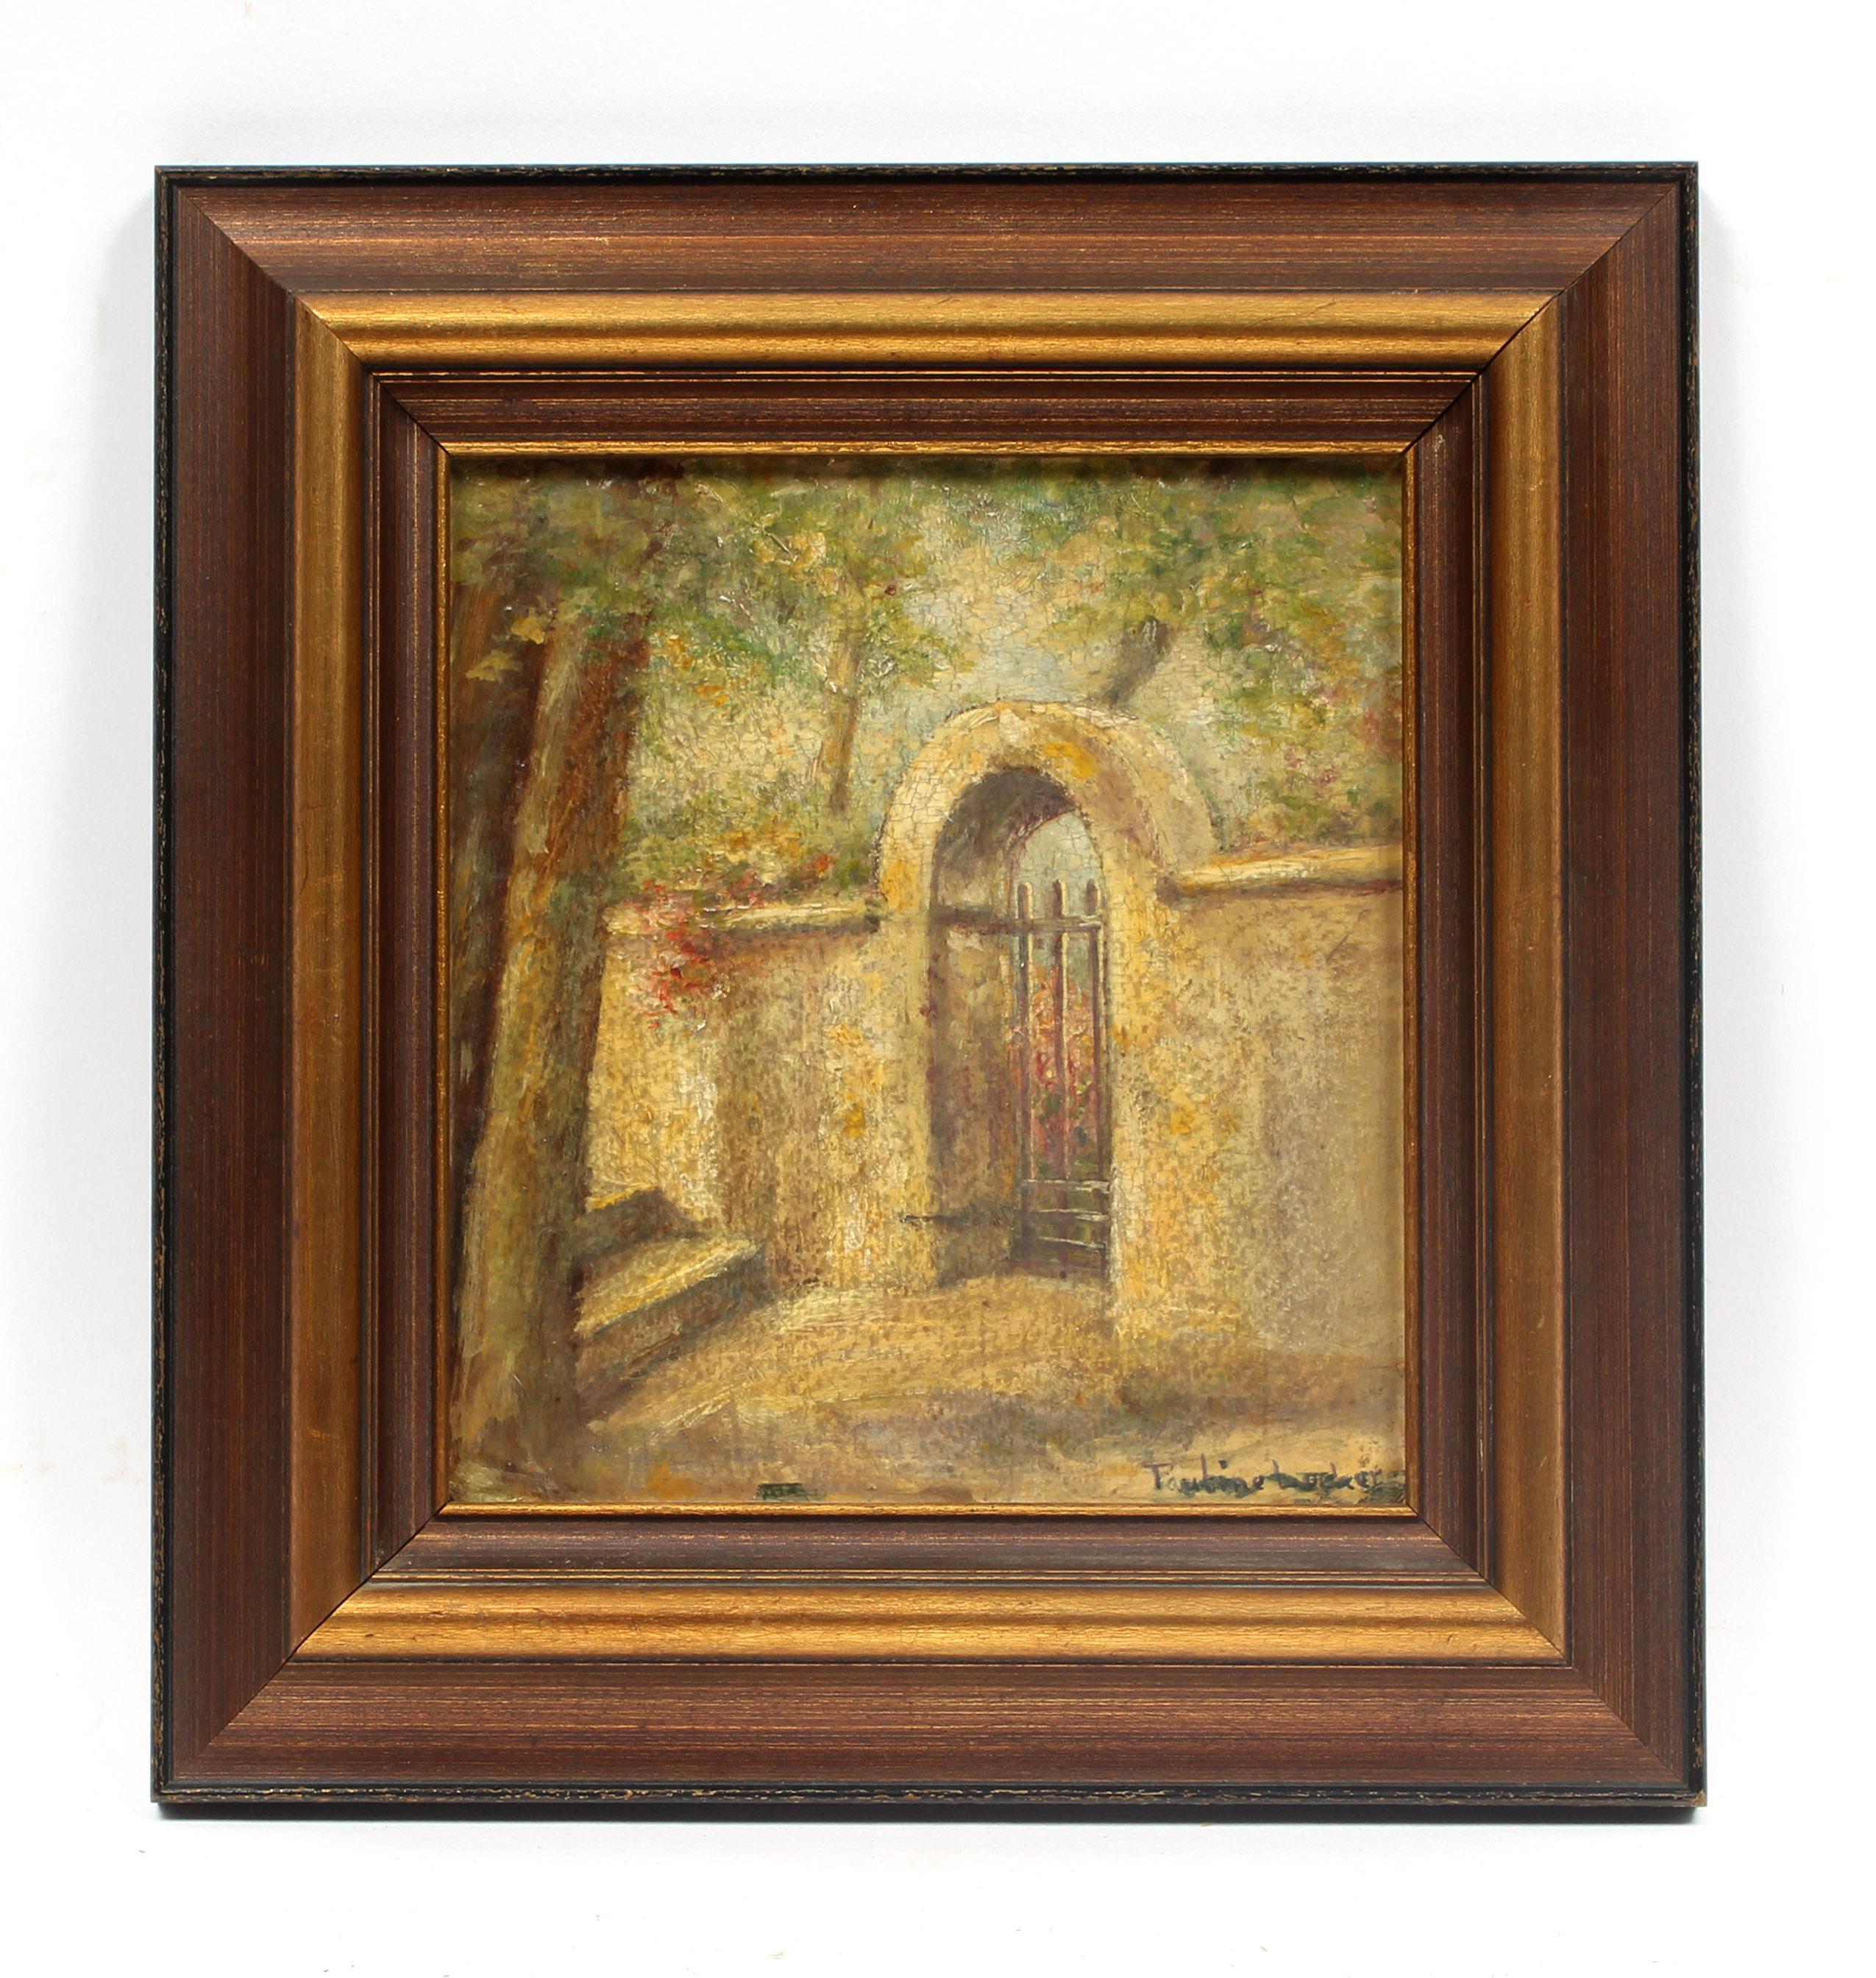 Antique American Impressionist Painting South Dakota 1909 Garden Gate Framed